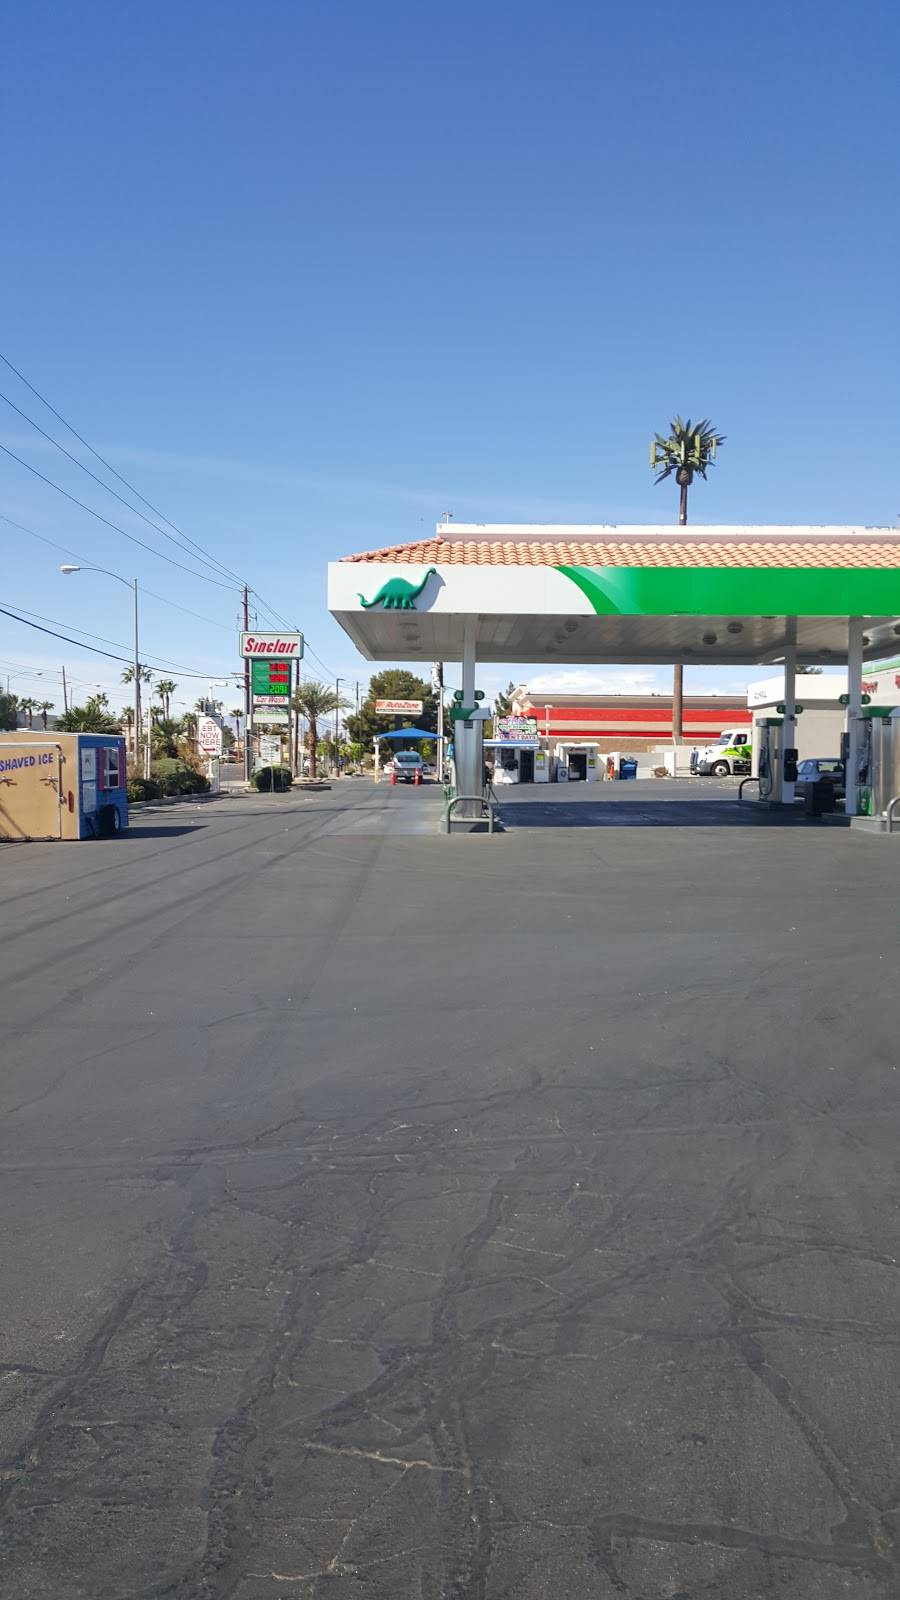 Nates Smog N Go Gas & Diesel - gas station  | Photo 5 of 9 | Address: 5782 E Charleston Blvd, Las Vegas, NV 89142, USA | Phone: (702) 438-4555